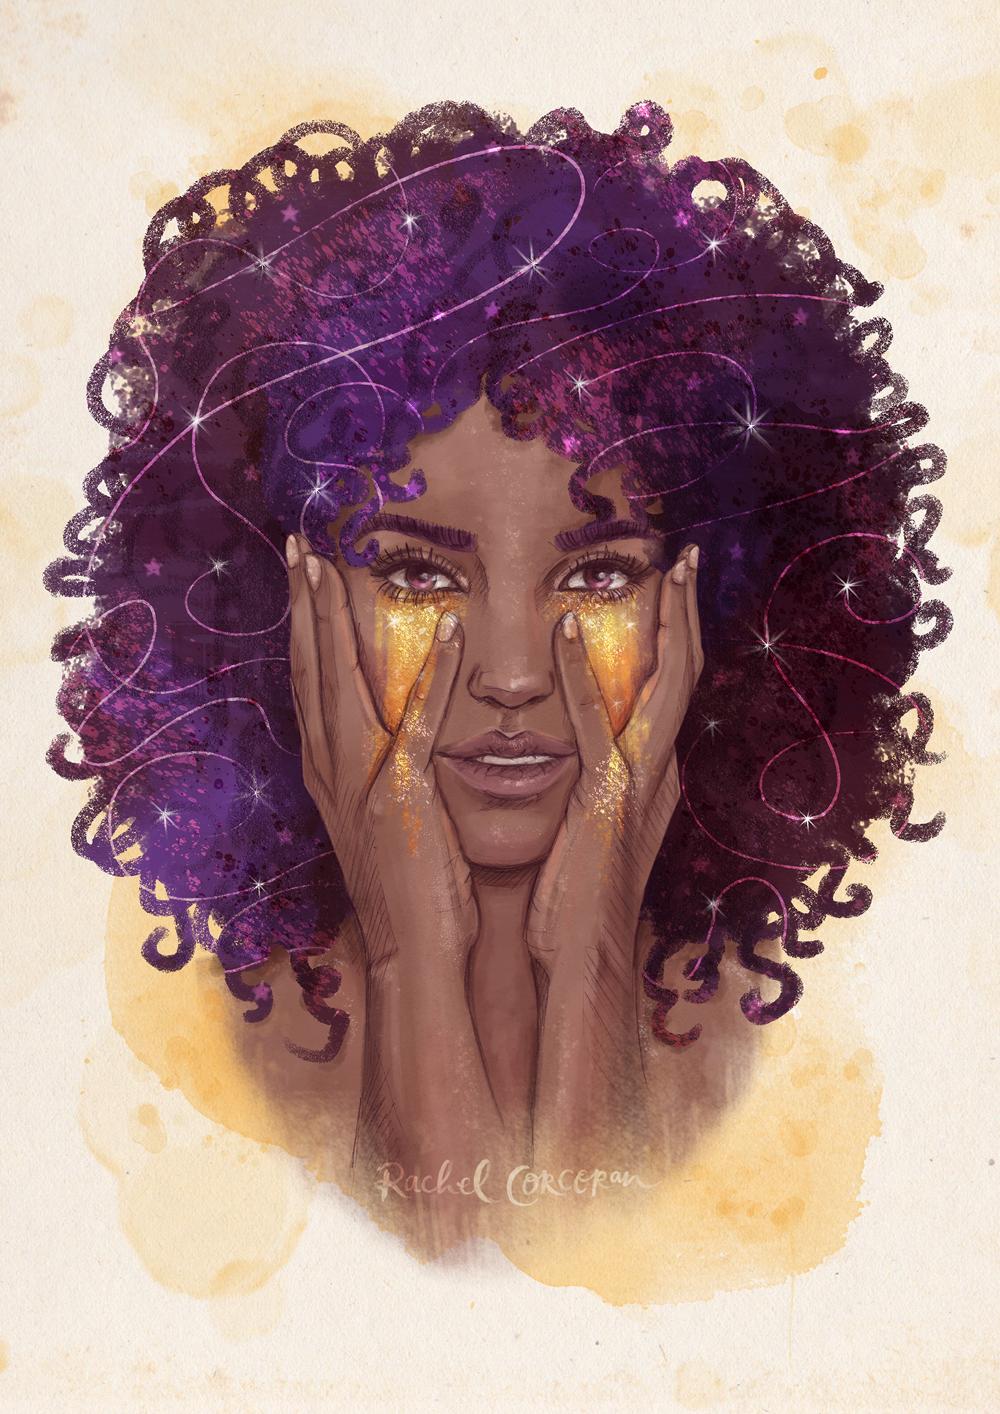 Stardust fashion illustration by Rachel Corcoran